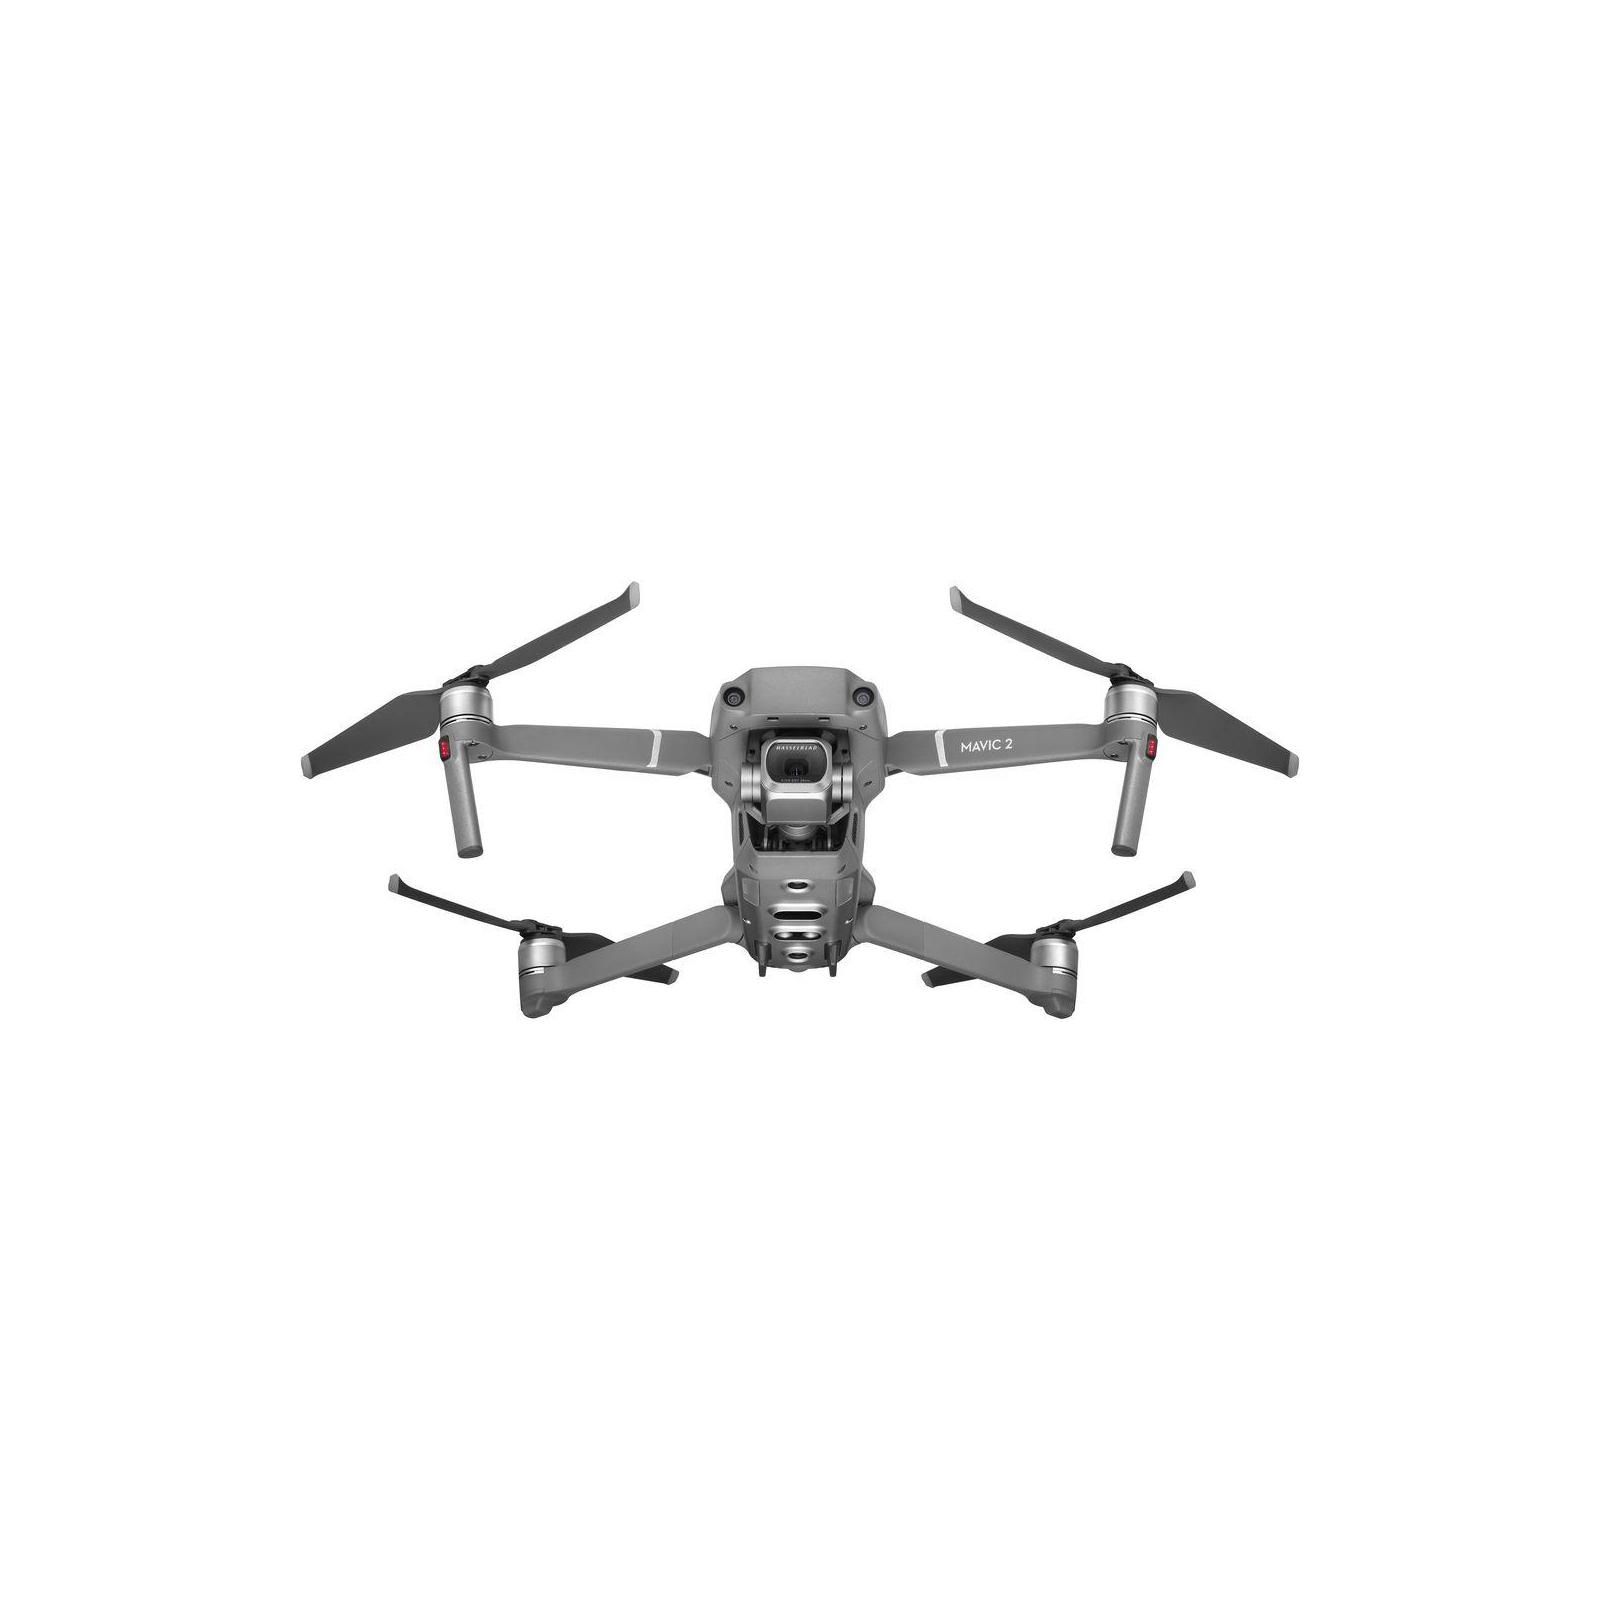 Квадрокоптер DJI Mavic 2 Pro (CP.MA.00000013.01) изображение 3